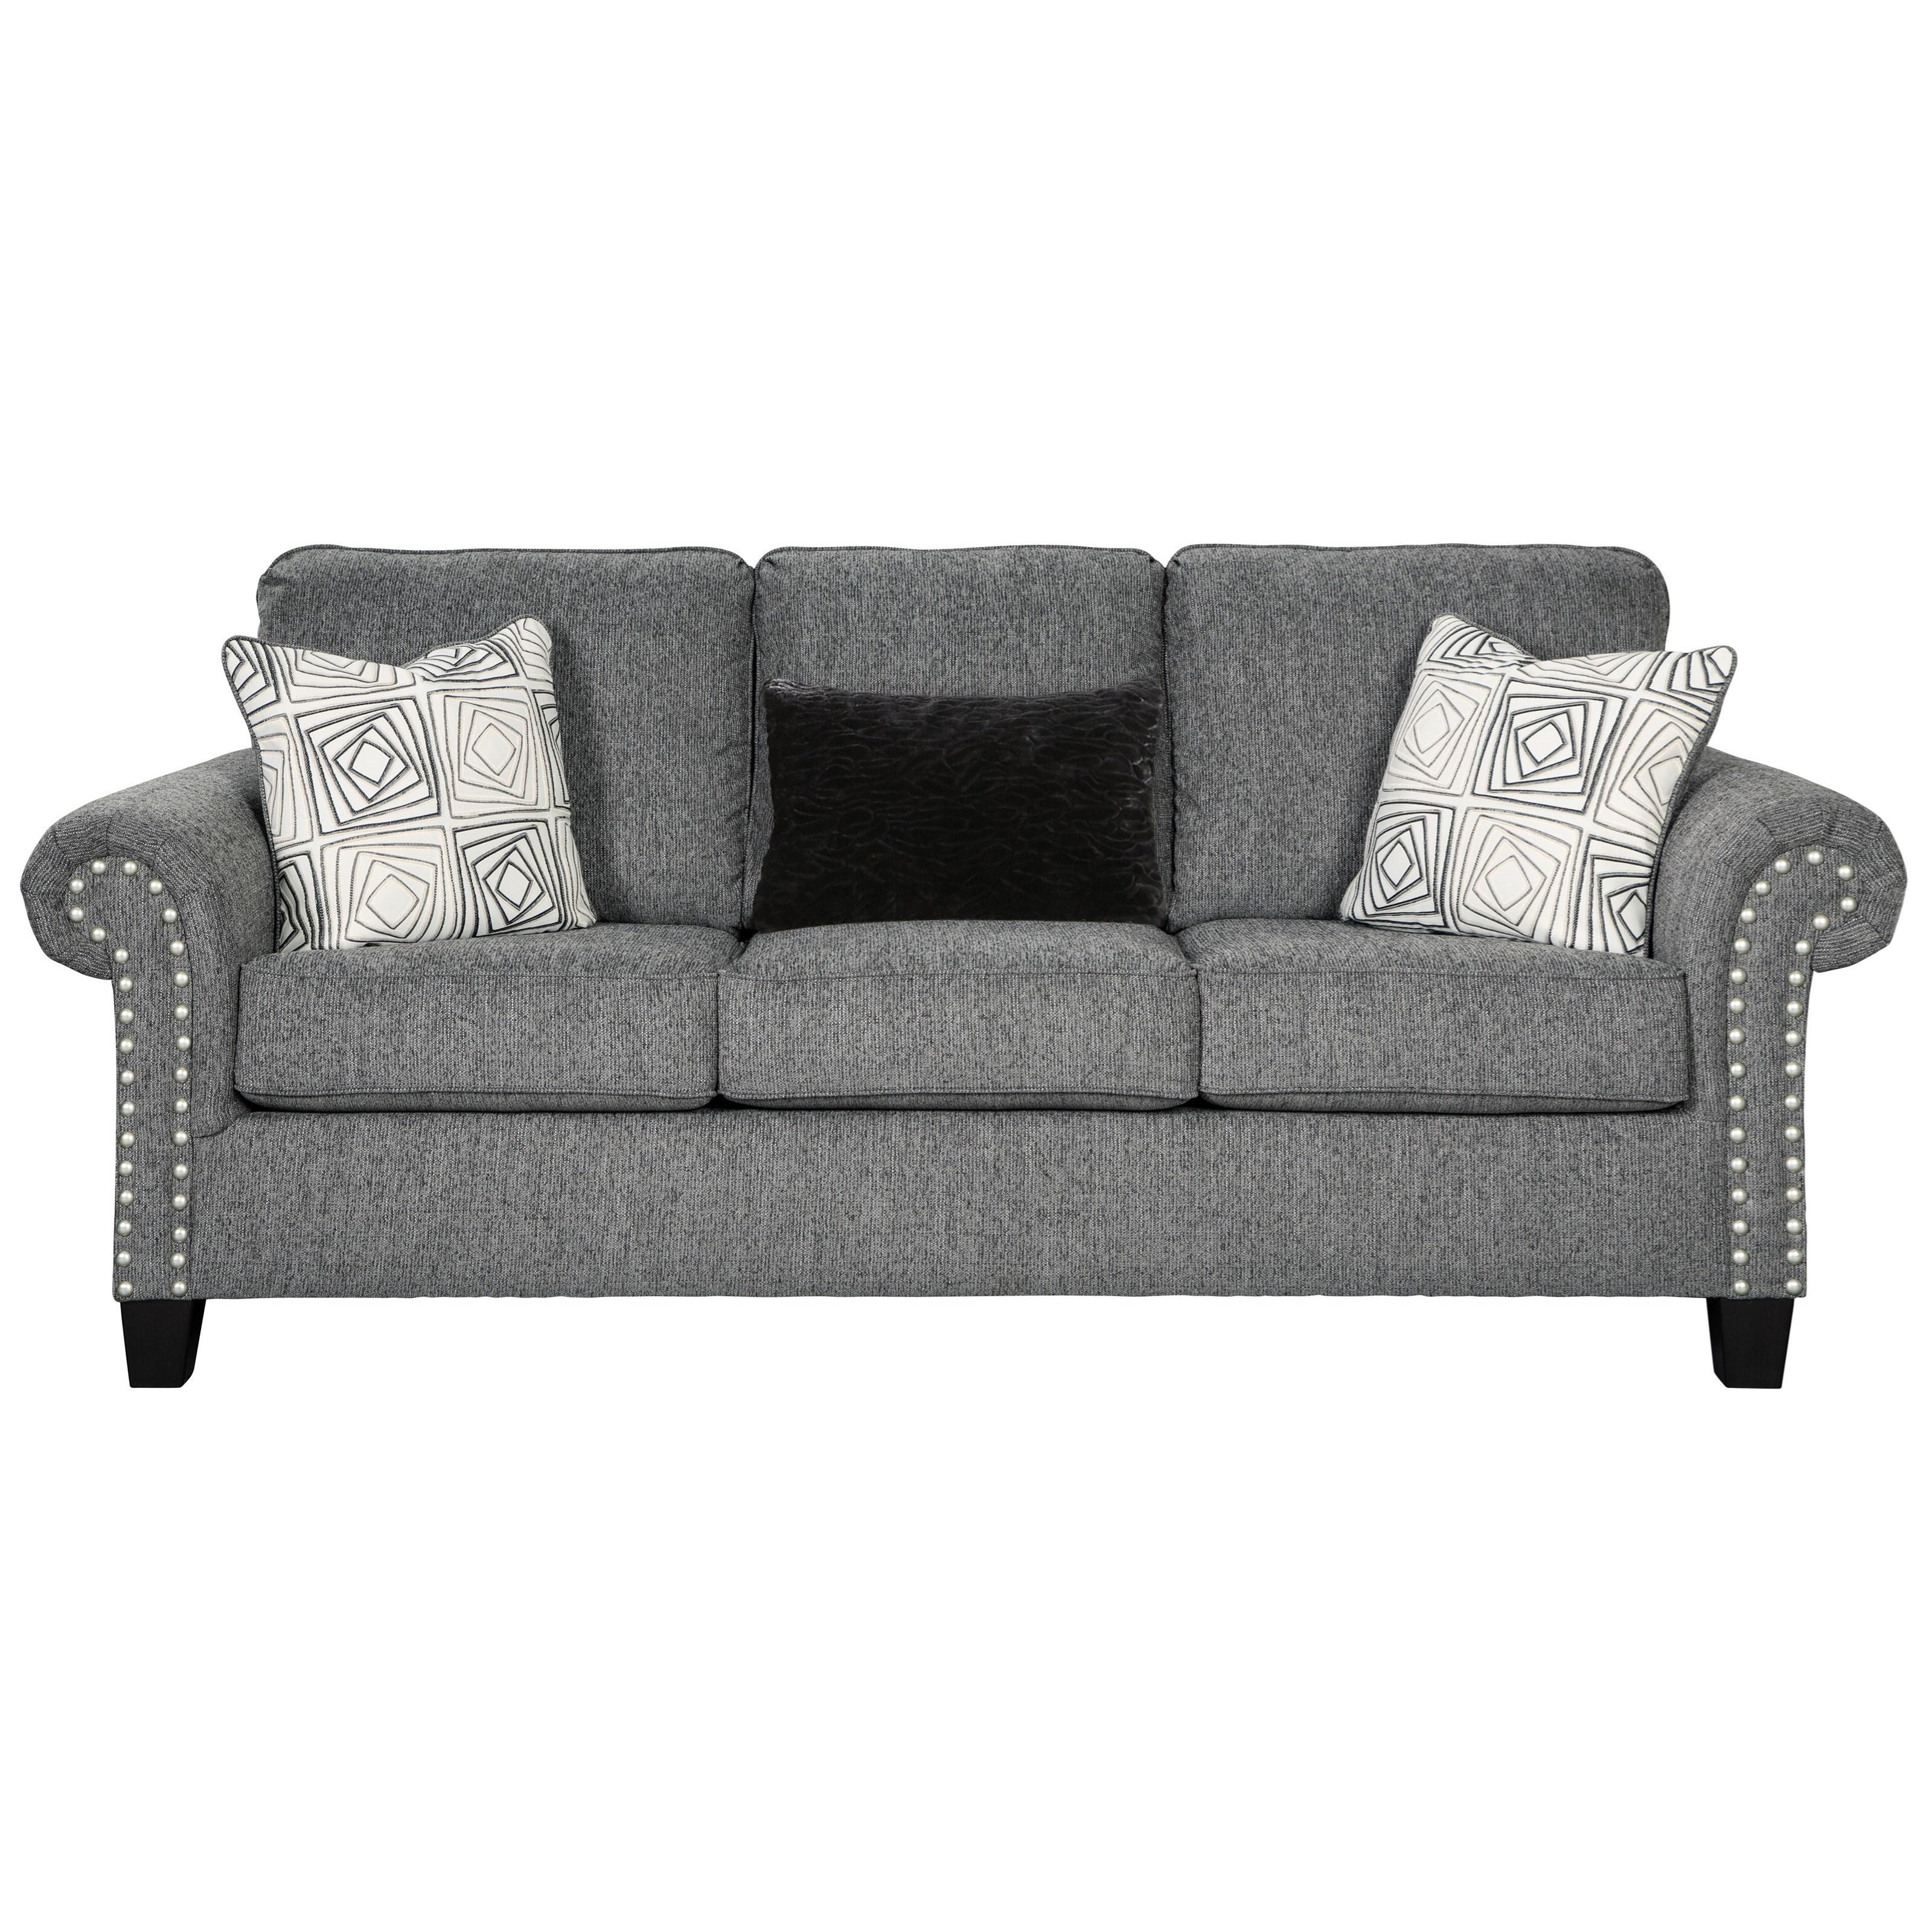 Benchcraft Agleno Queen Sofa Sleeper with Memory Foam Mattress